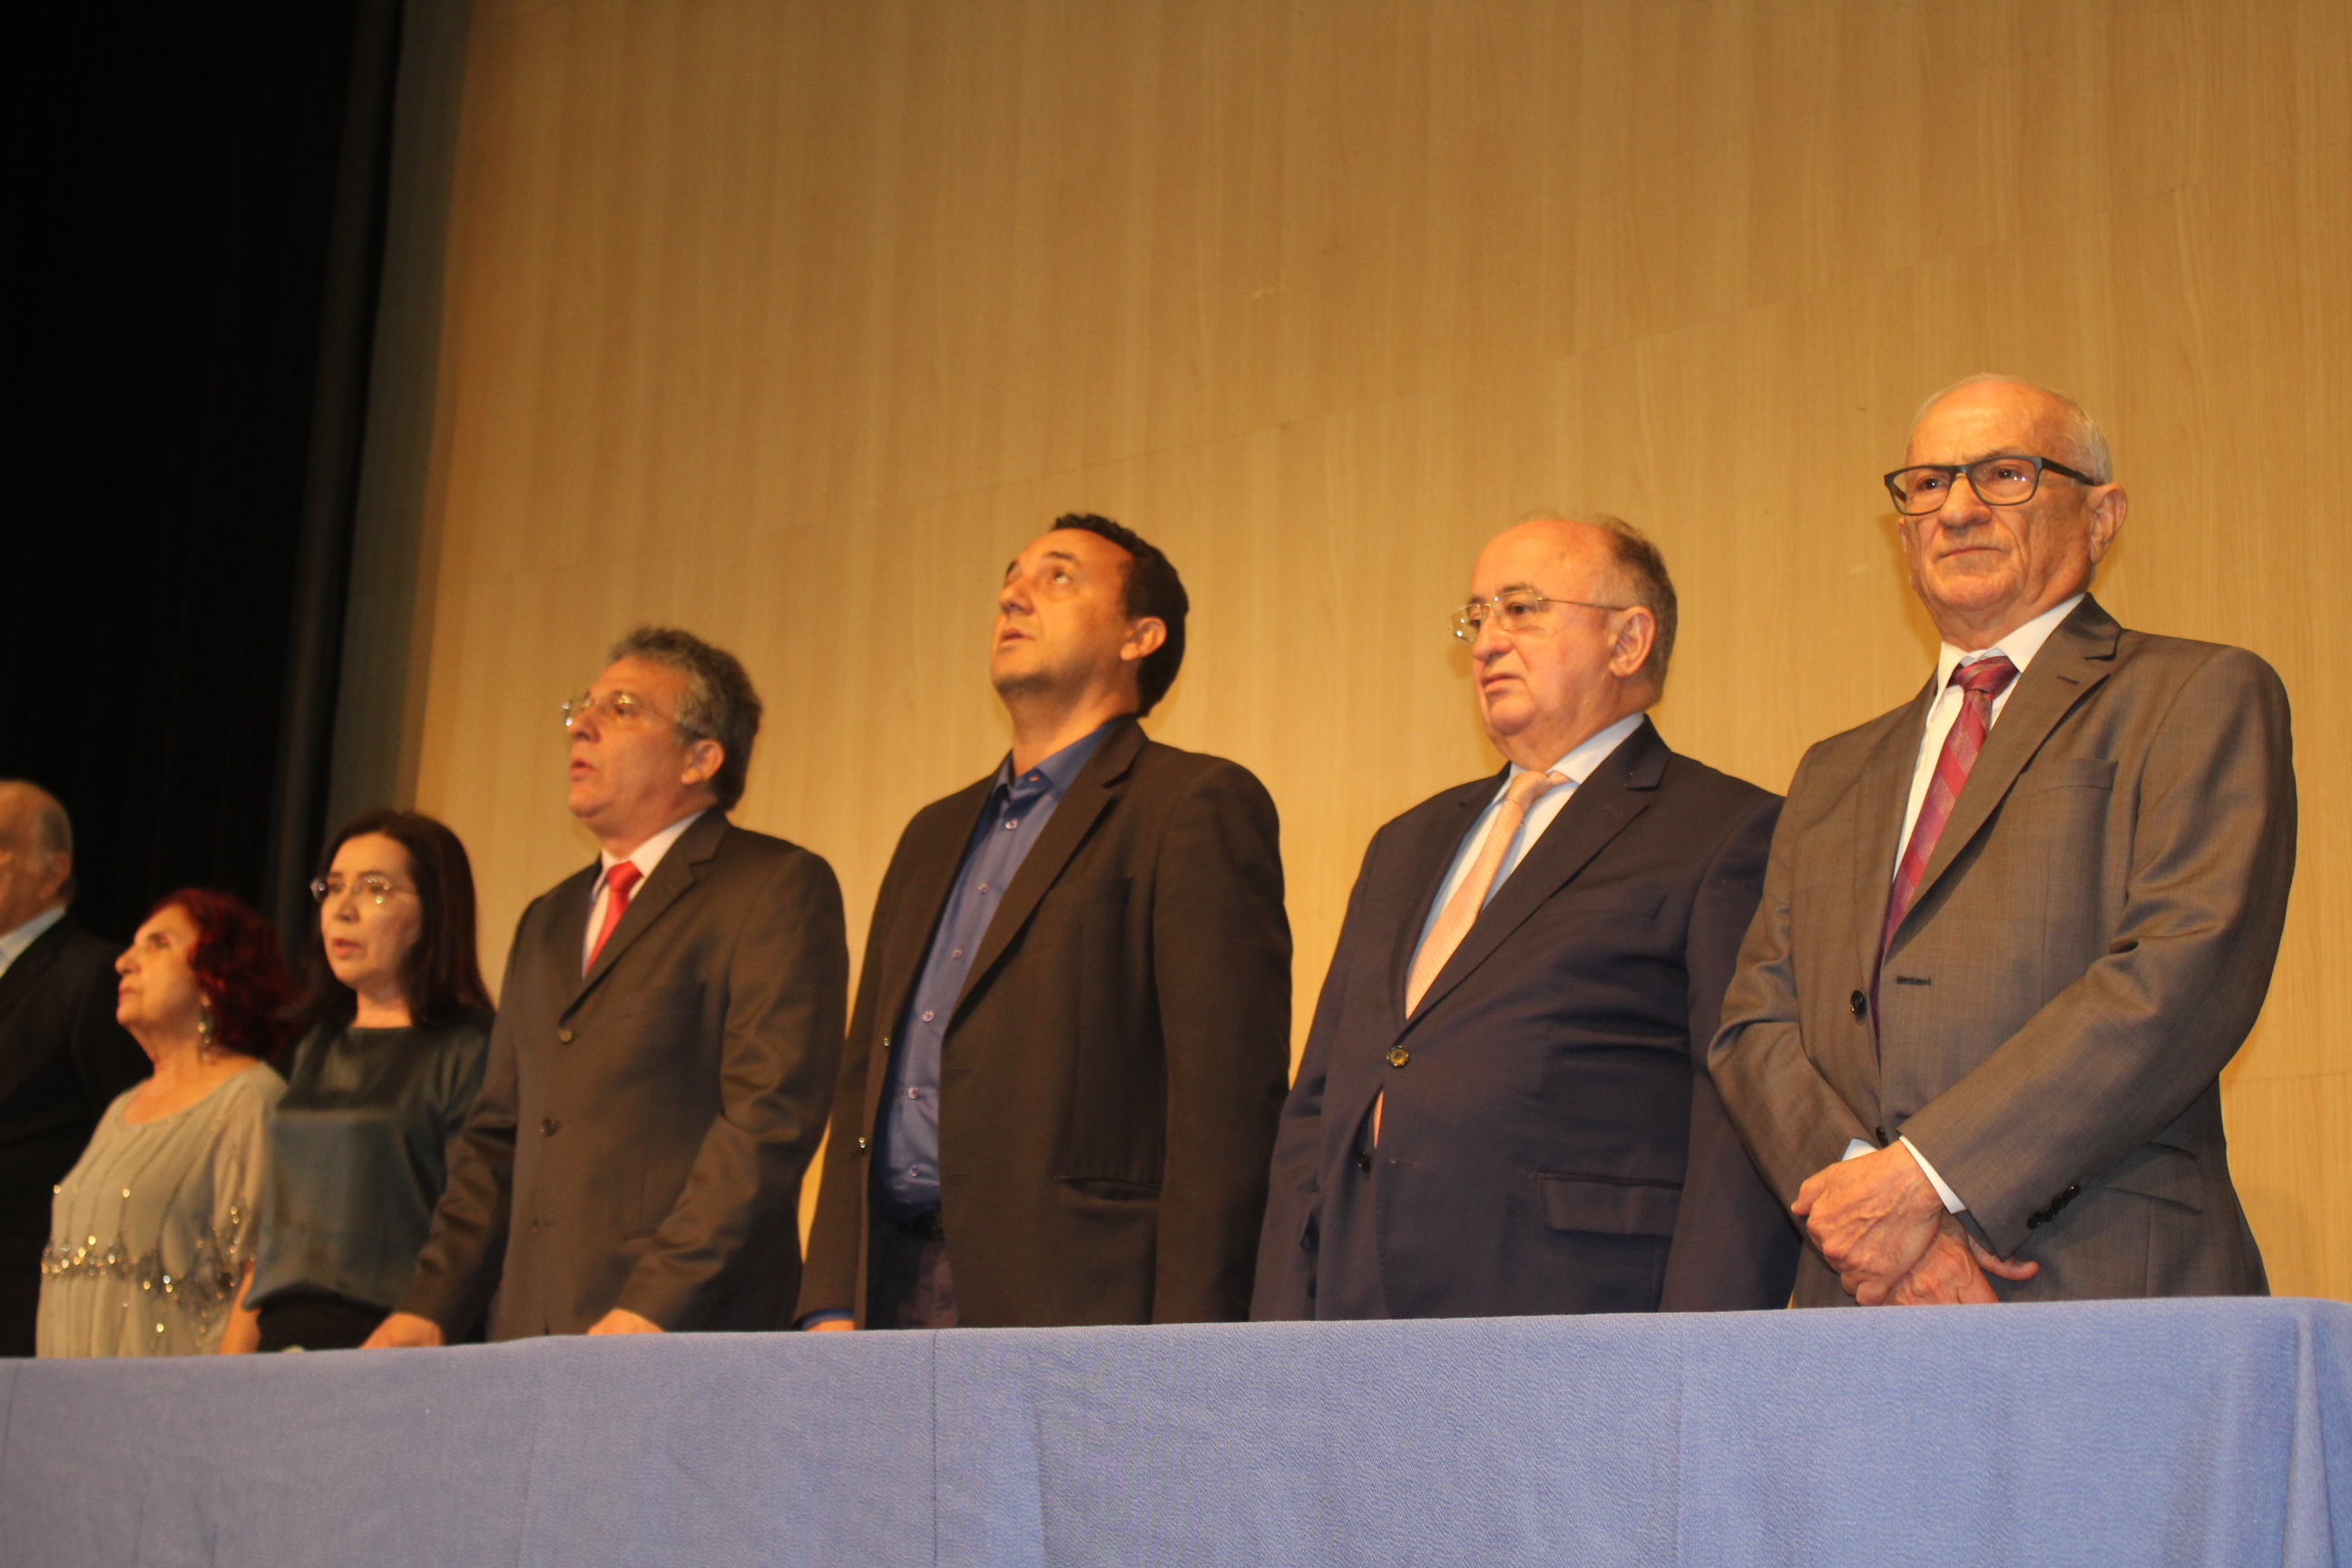 Economista Felipe Mendes toma posse como imortal da Academia Piauiense de Letras